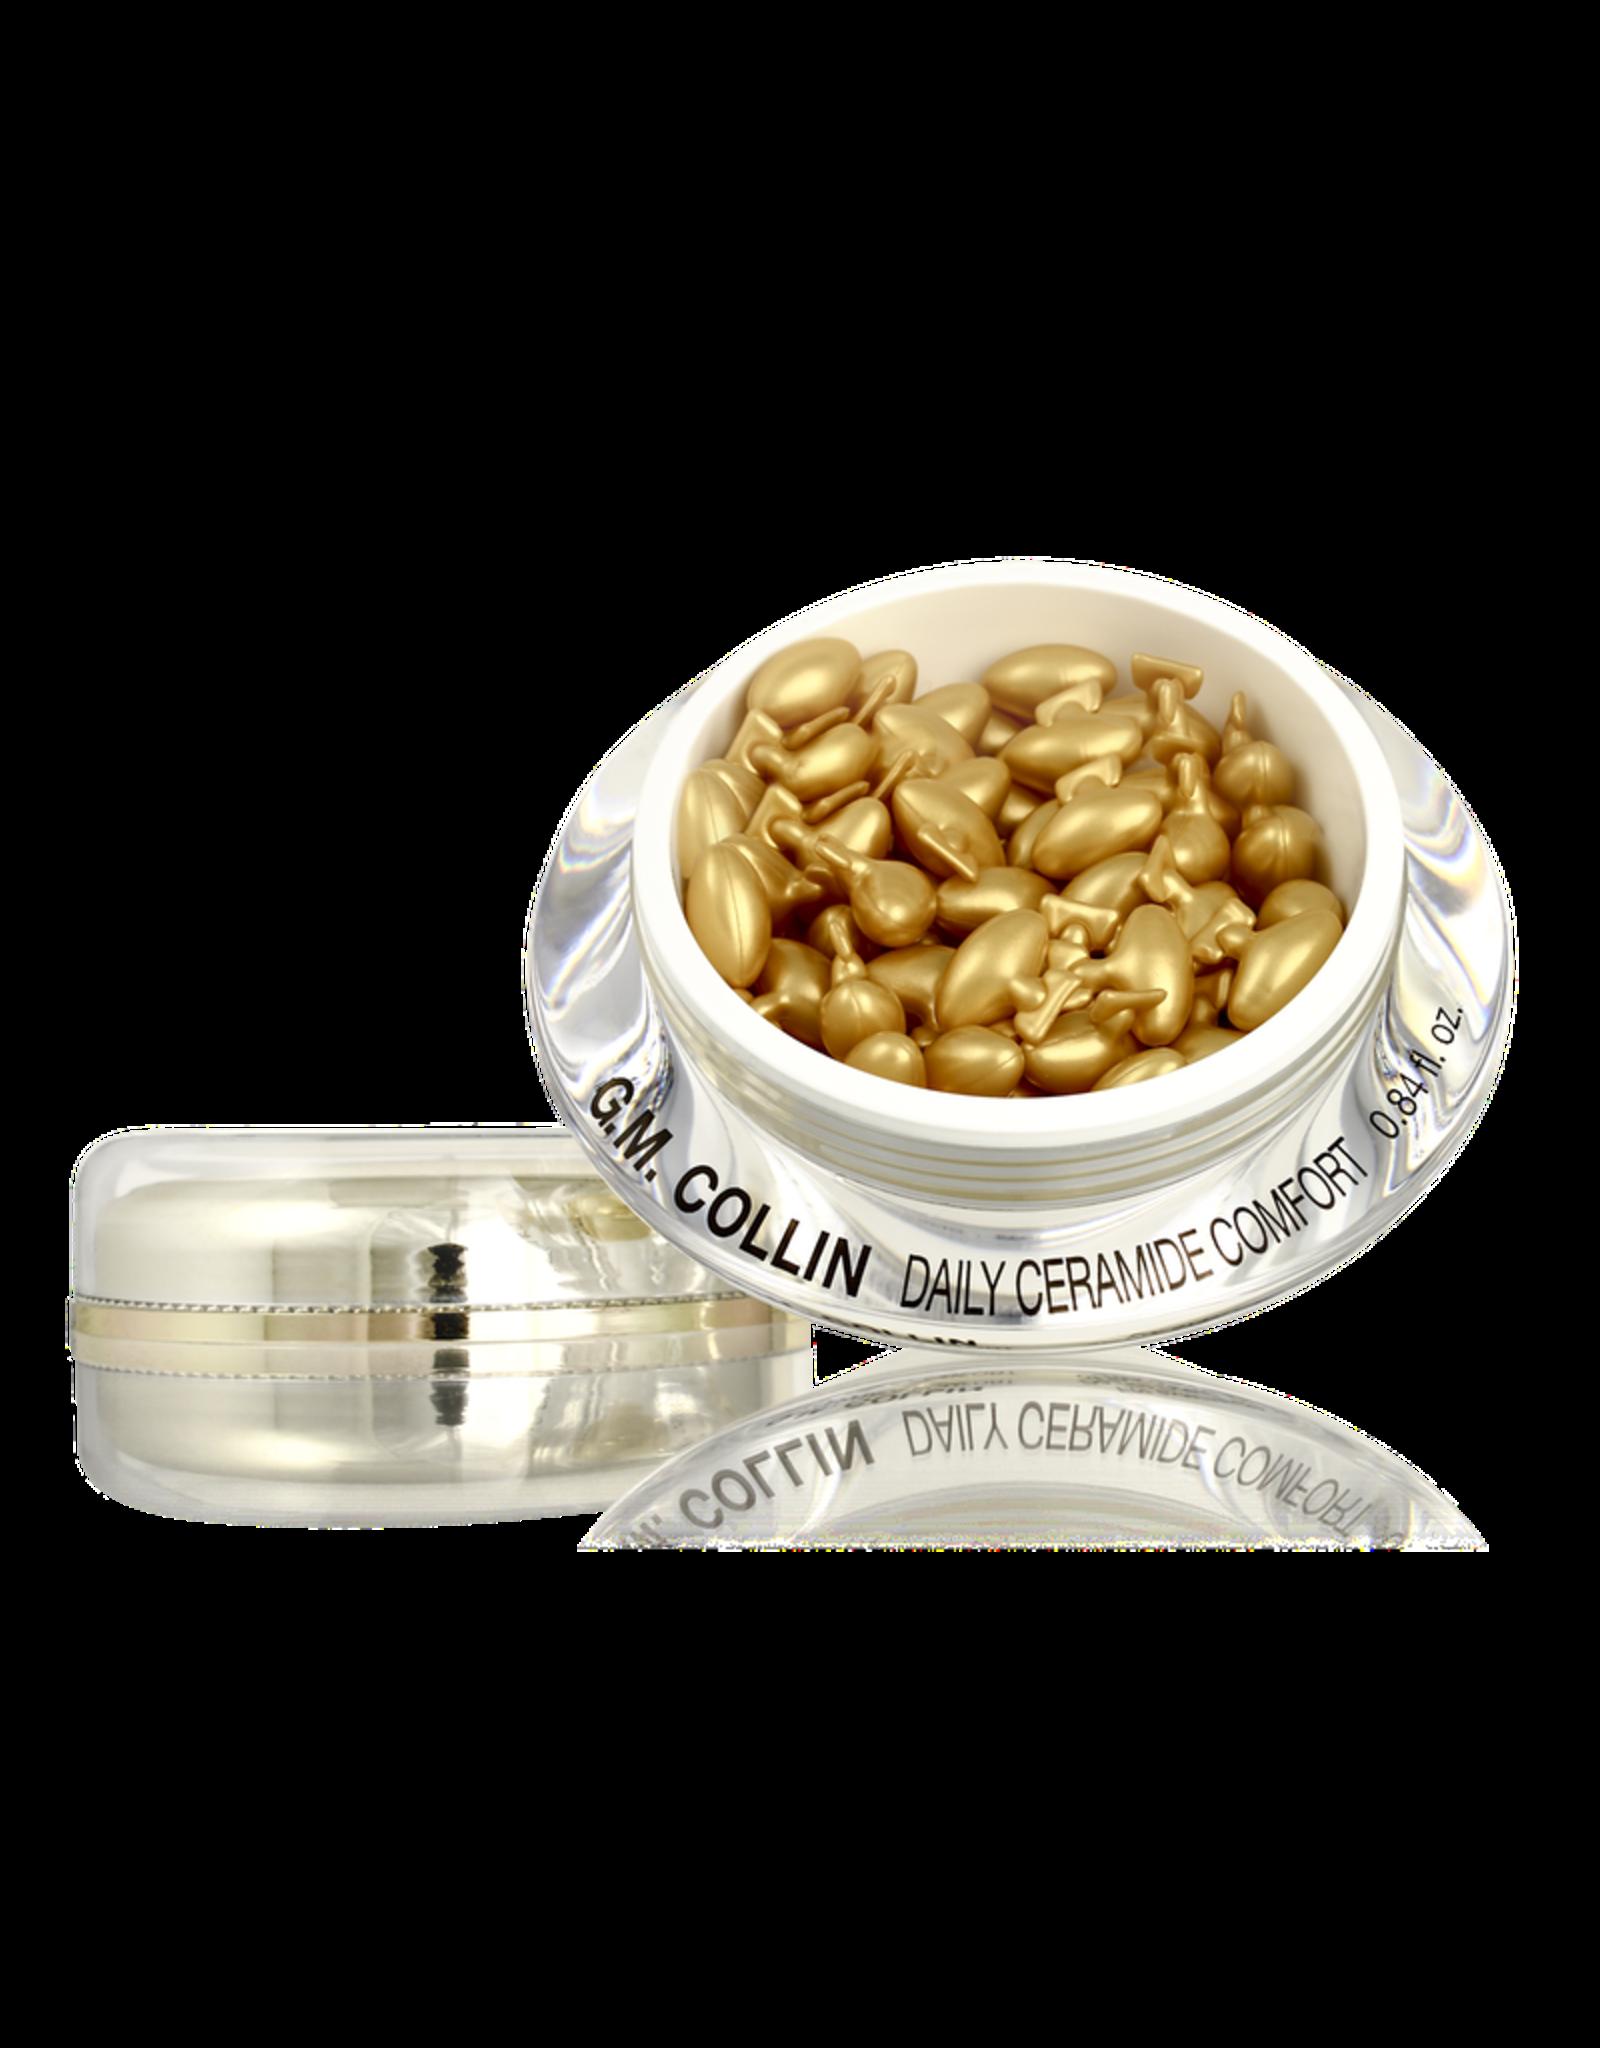 GM Collin G.M. Collin Daily Ceramide Comfort, 75 Capsules